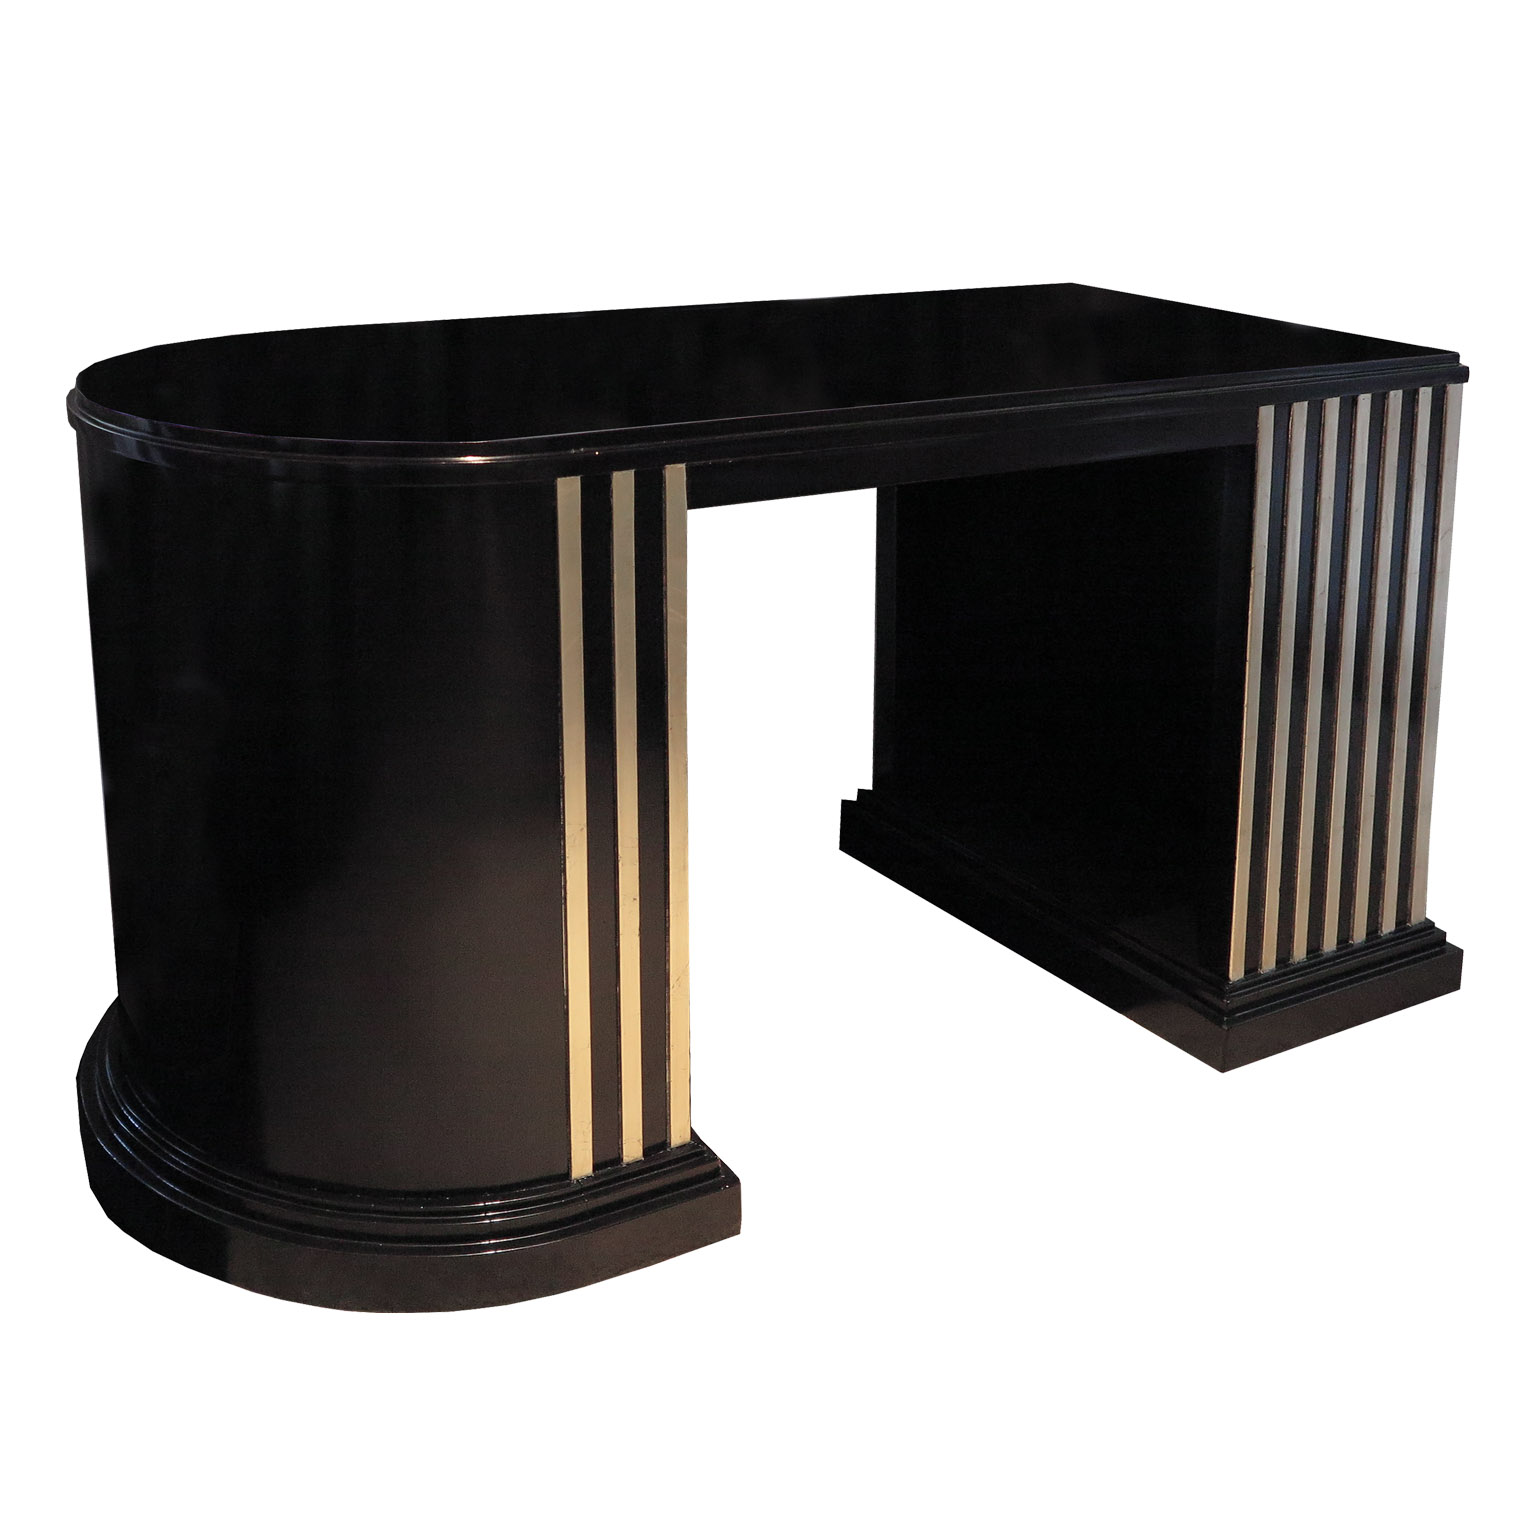 Black demi lune desk with white gold leaf linear details